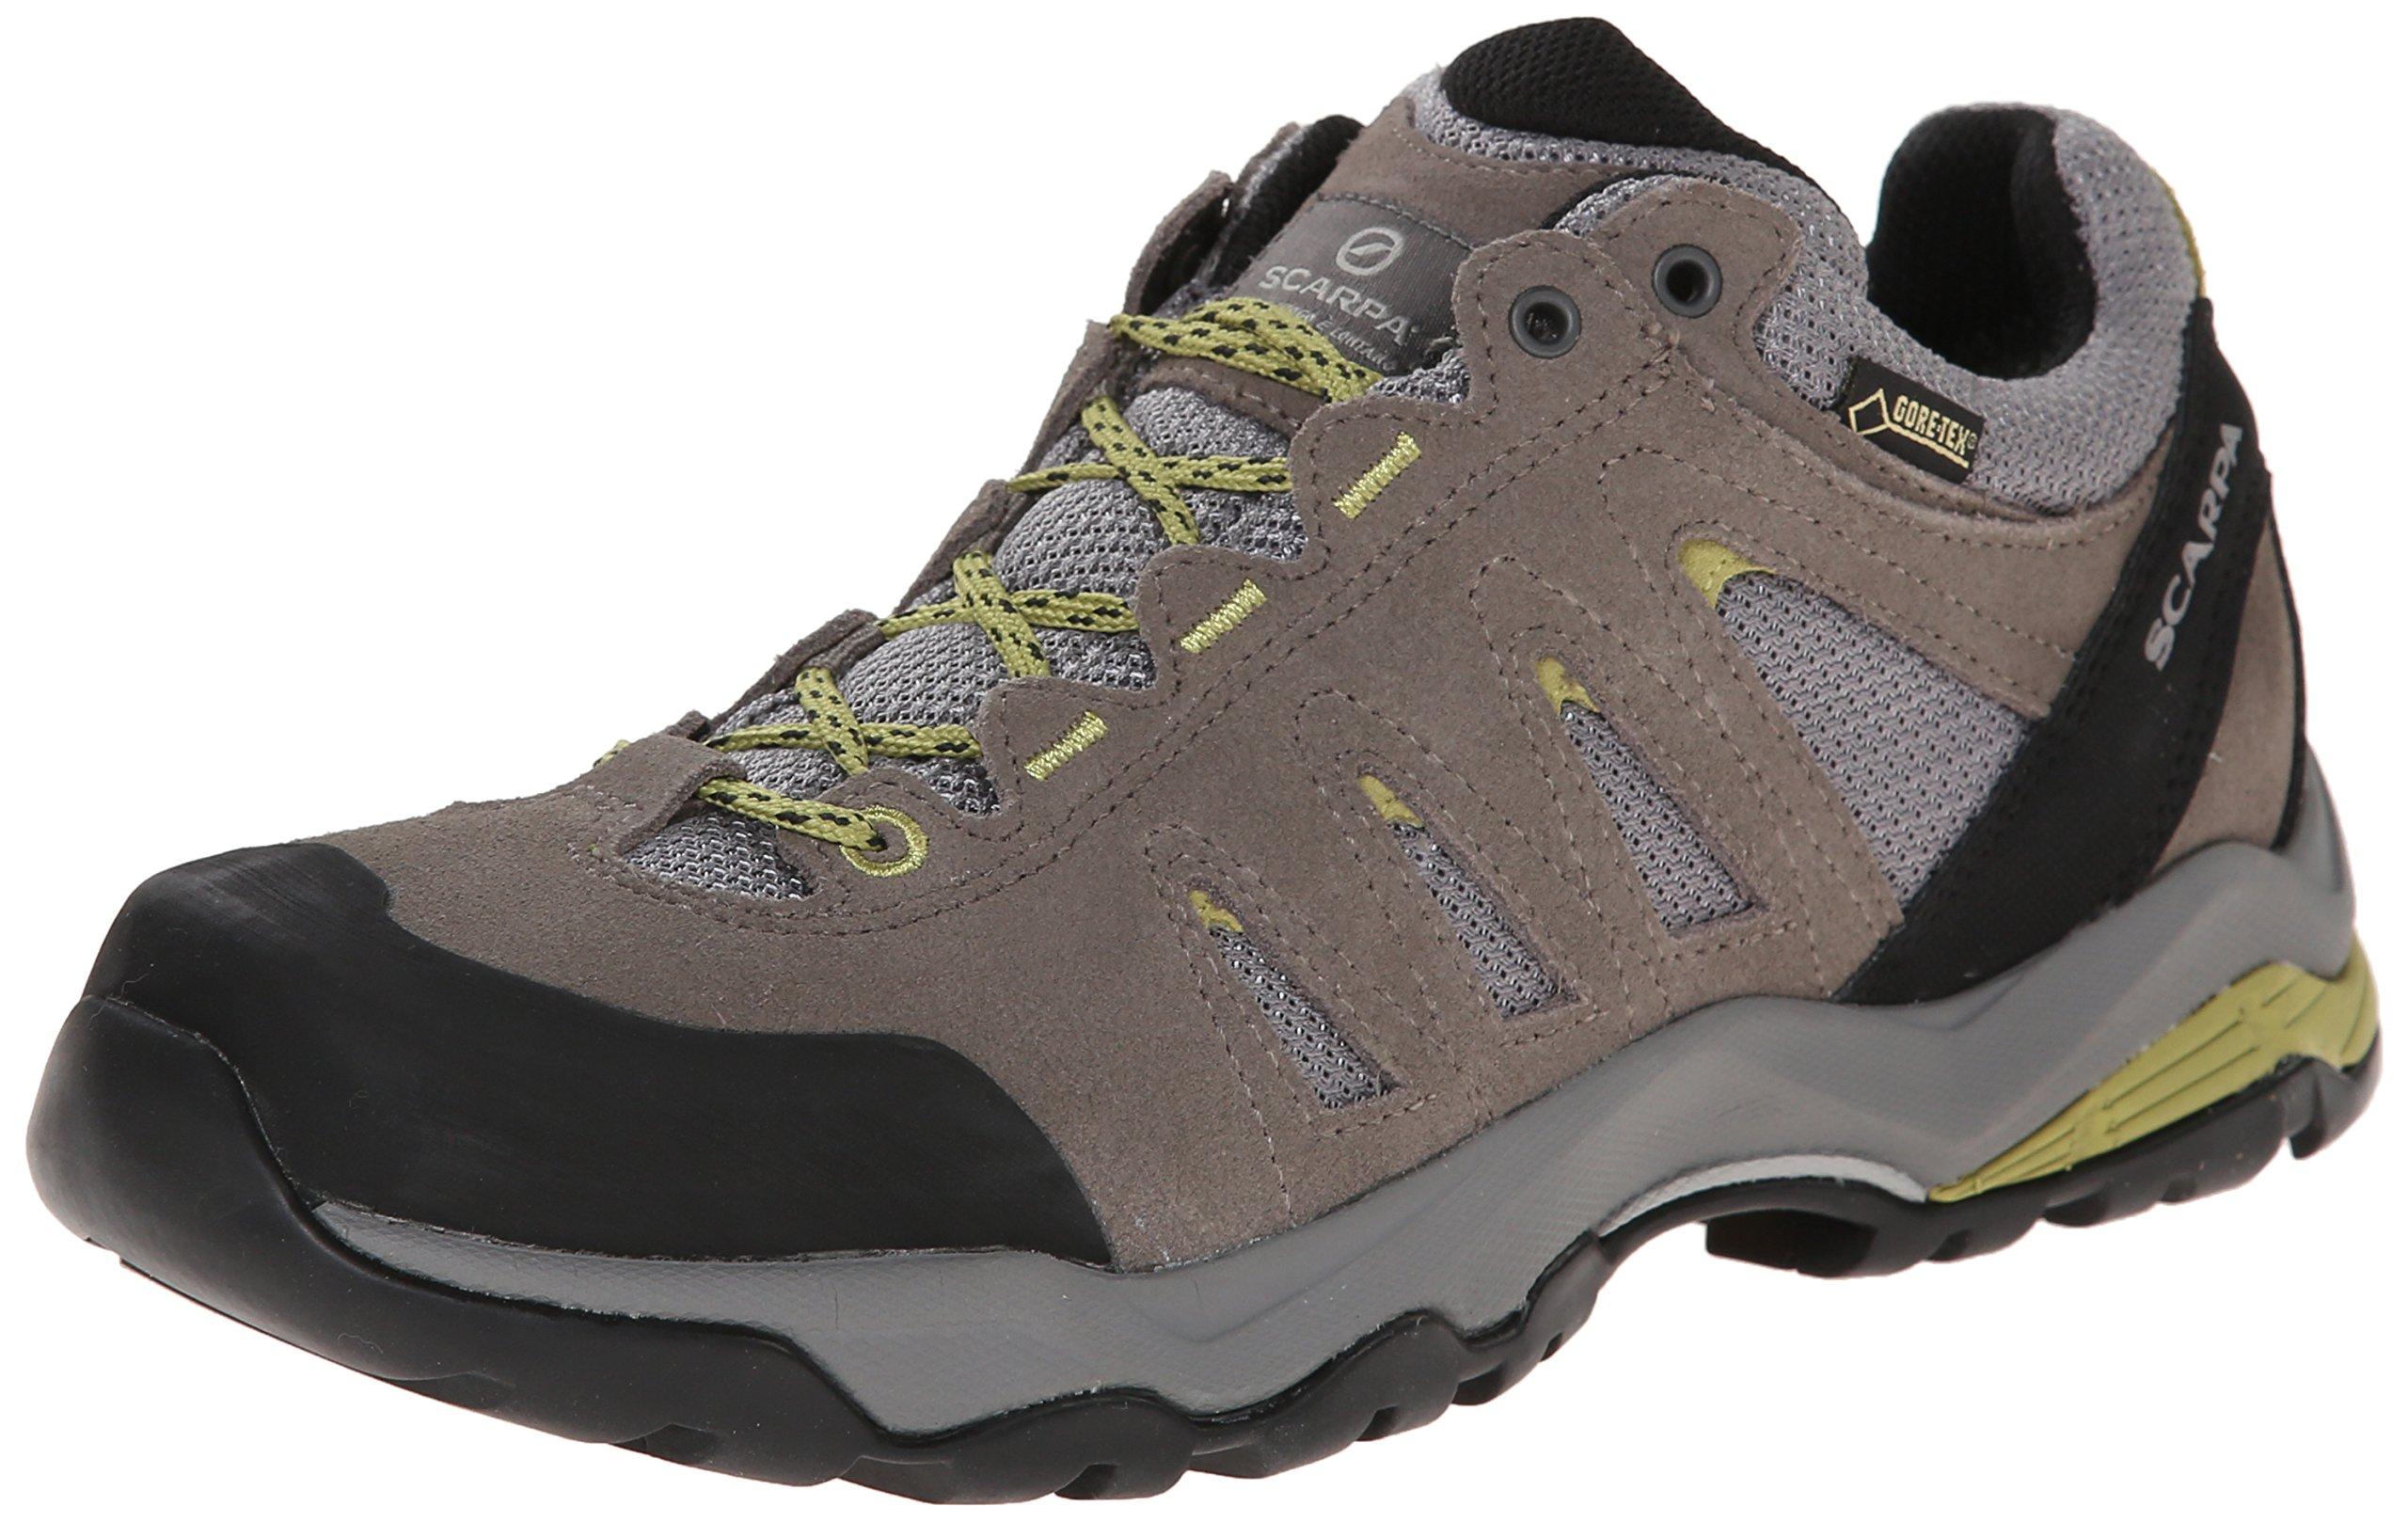 SCARPA Women's Moraine GTX Hiking Shoe, Taupe/Celery, 37 EU/6 M US